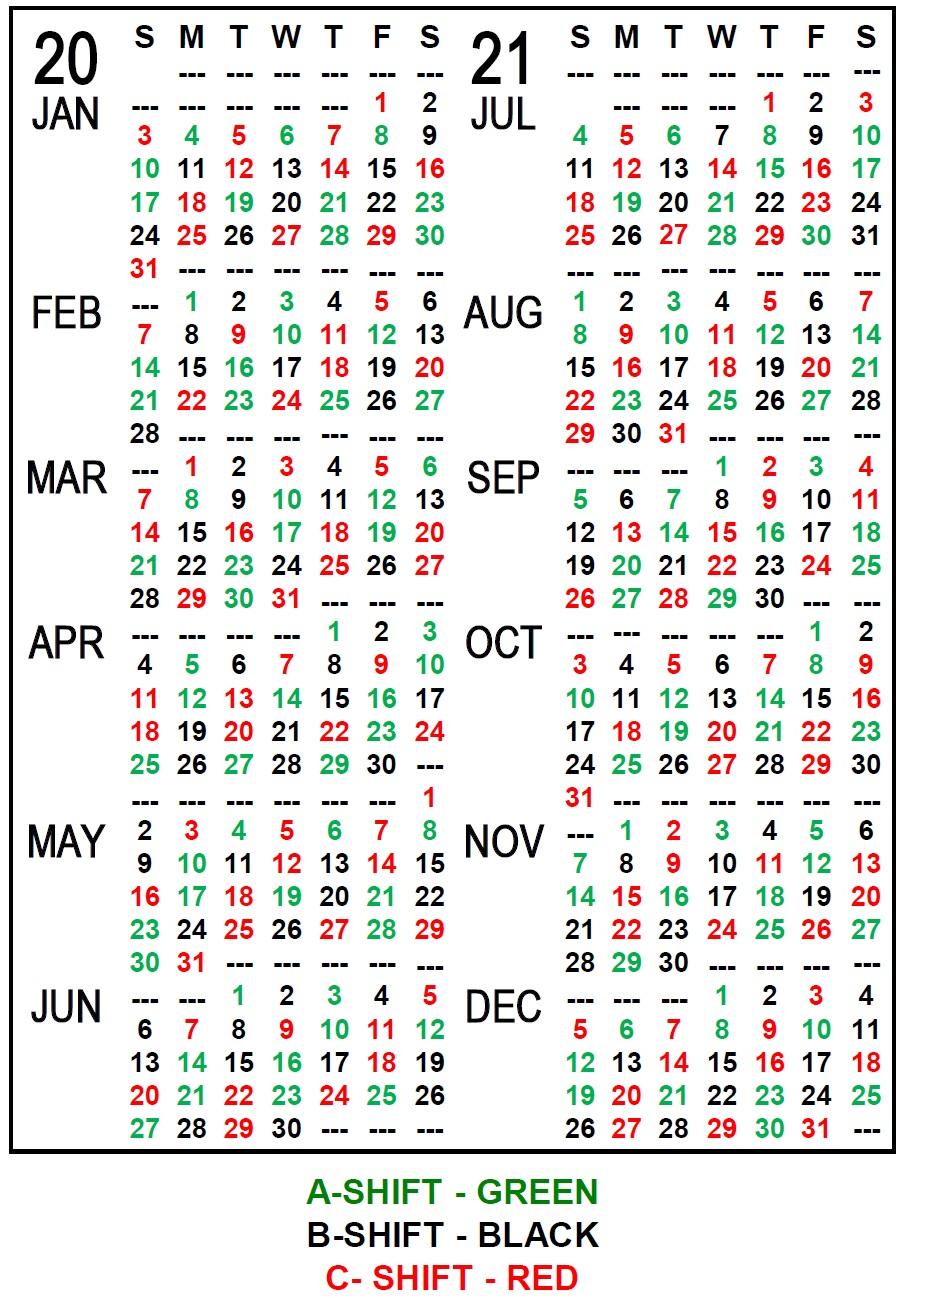 Shift Calendar 2021 Free | Calendar Printables Free Blank with regard to Shift Schedule 2021